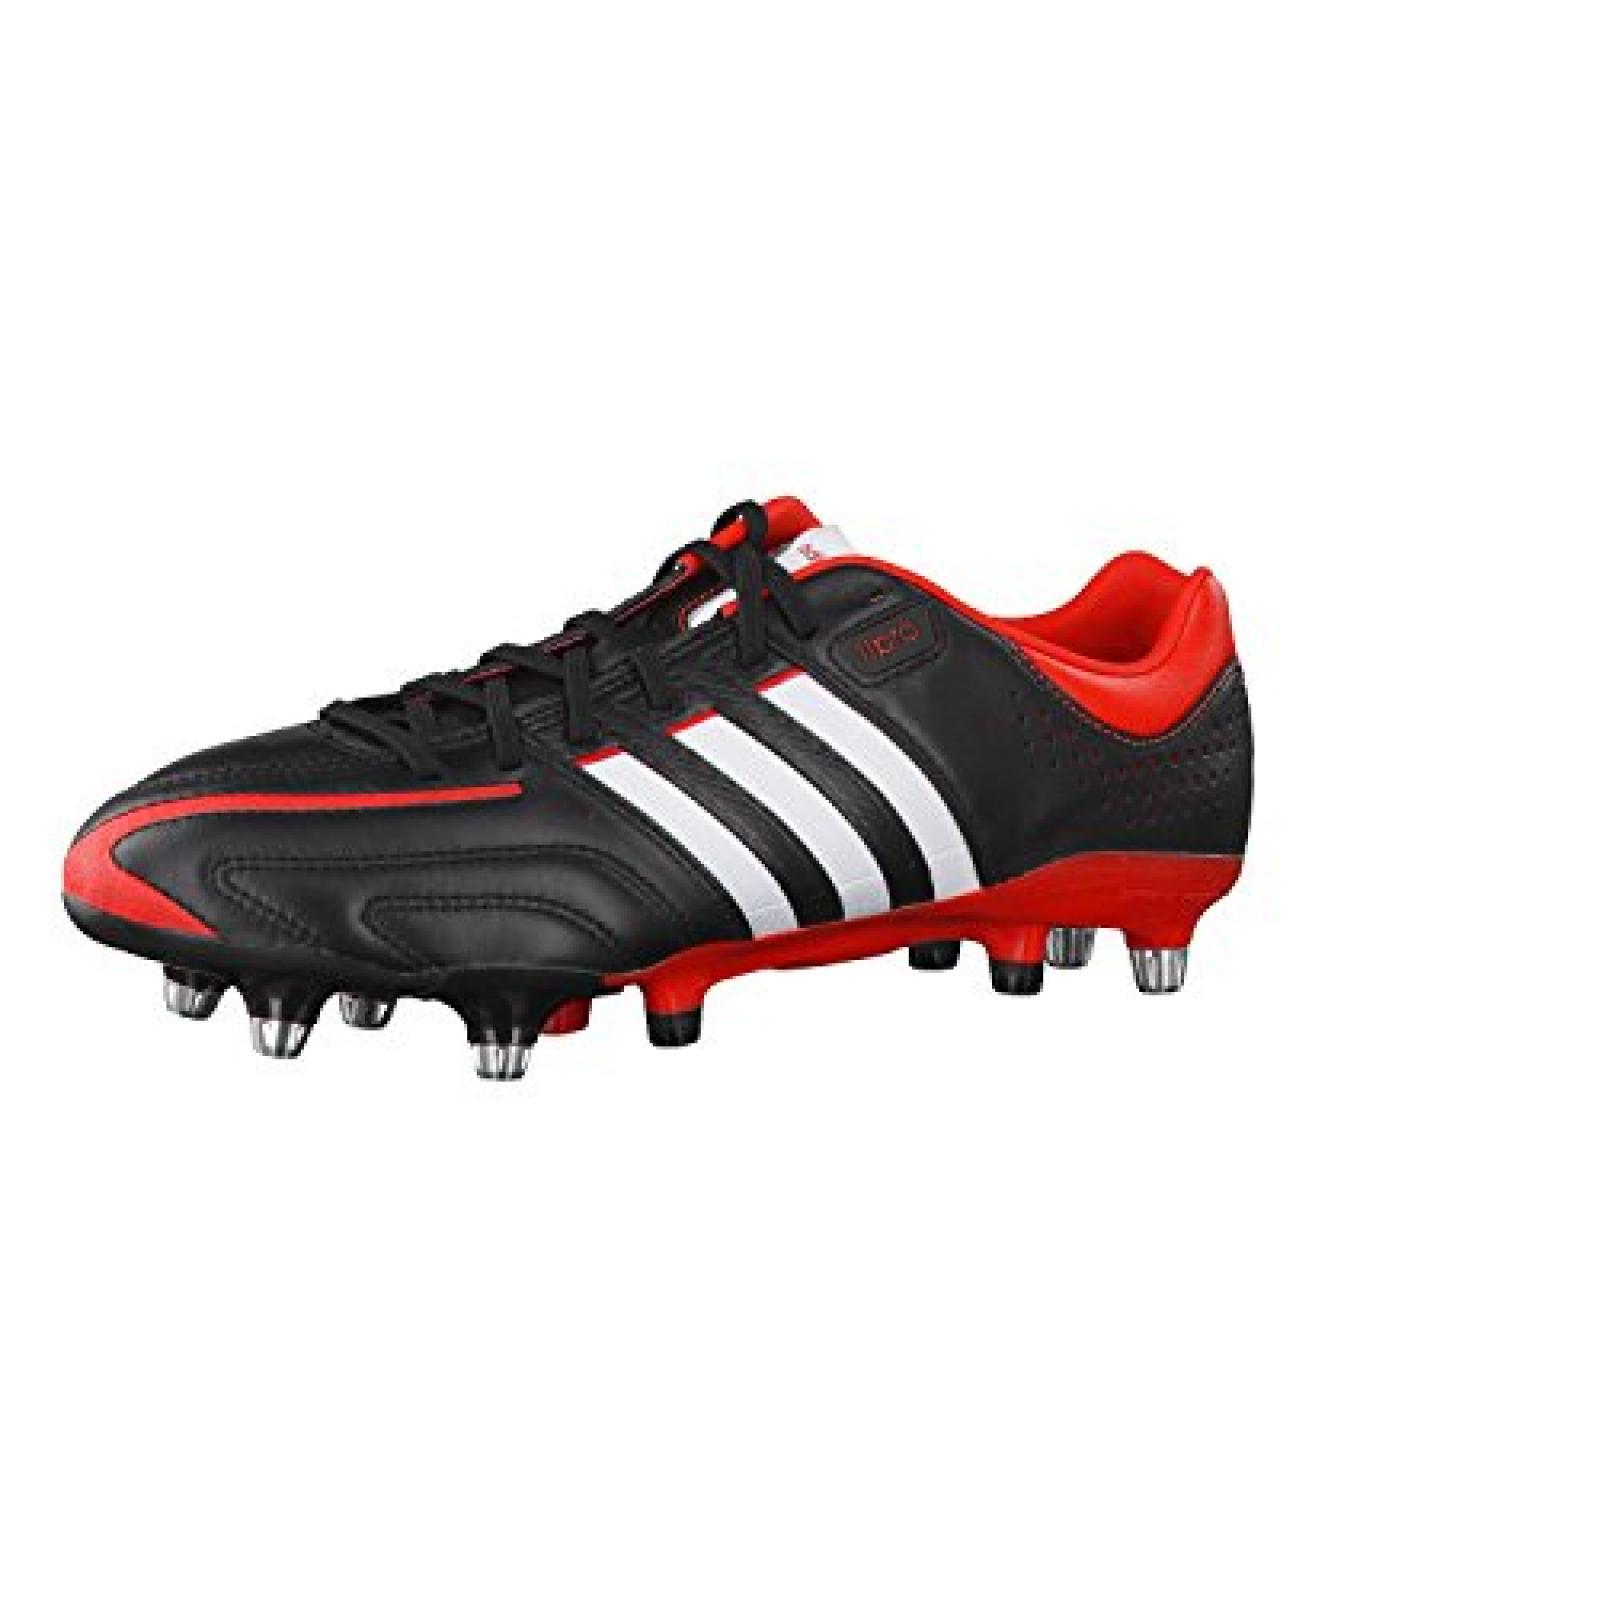 Adidas adipure 11Pro XTRX SG Fußballschuh Herren